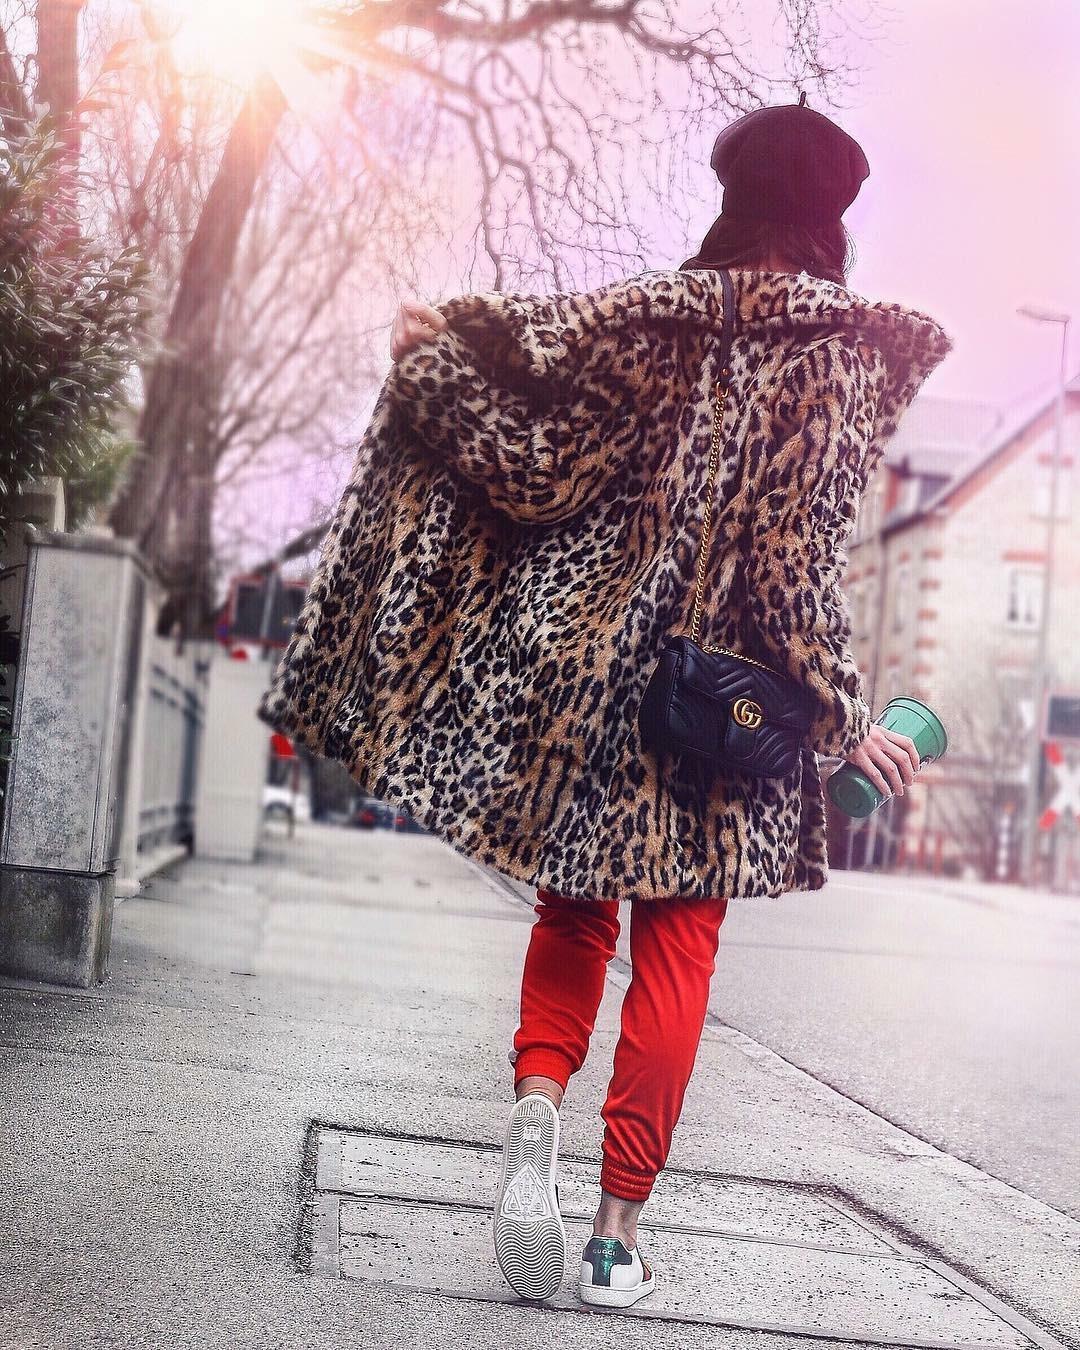 Leo Coat & Sweatpants and a very talented Fashion Illustrator